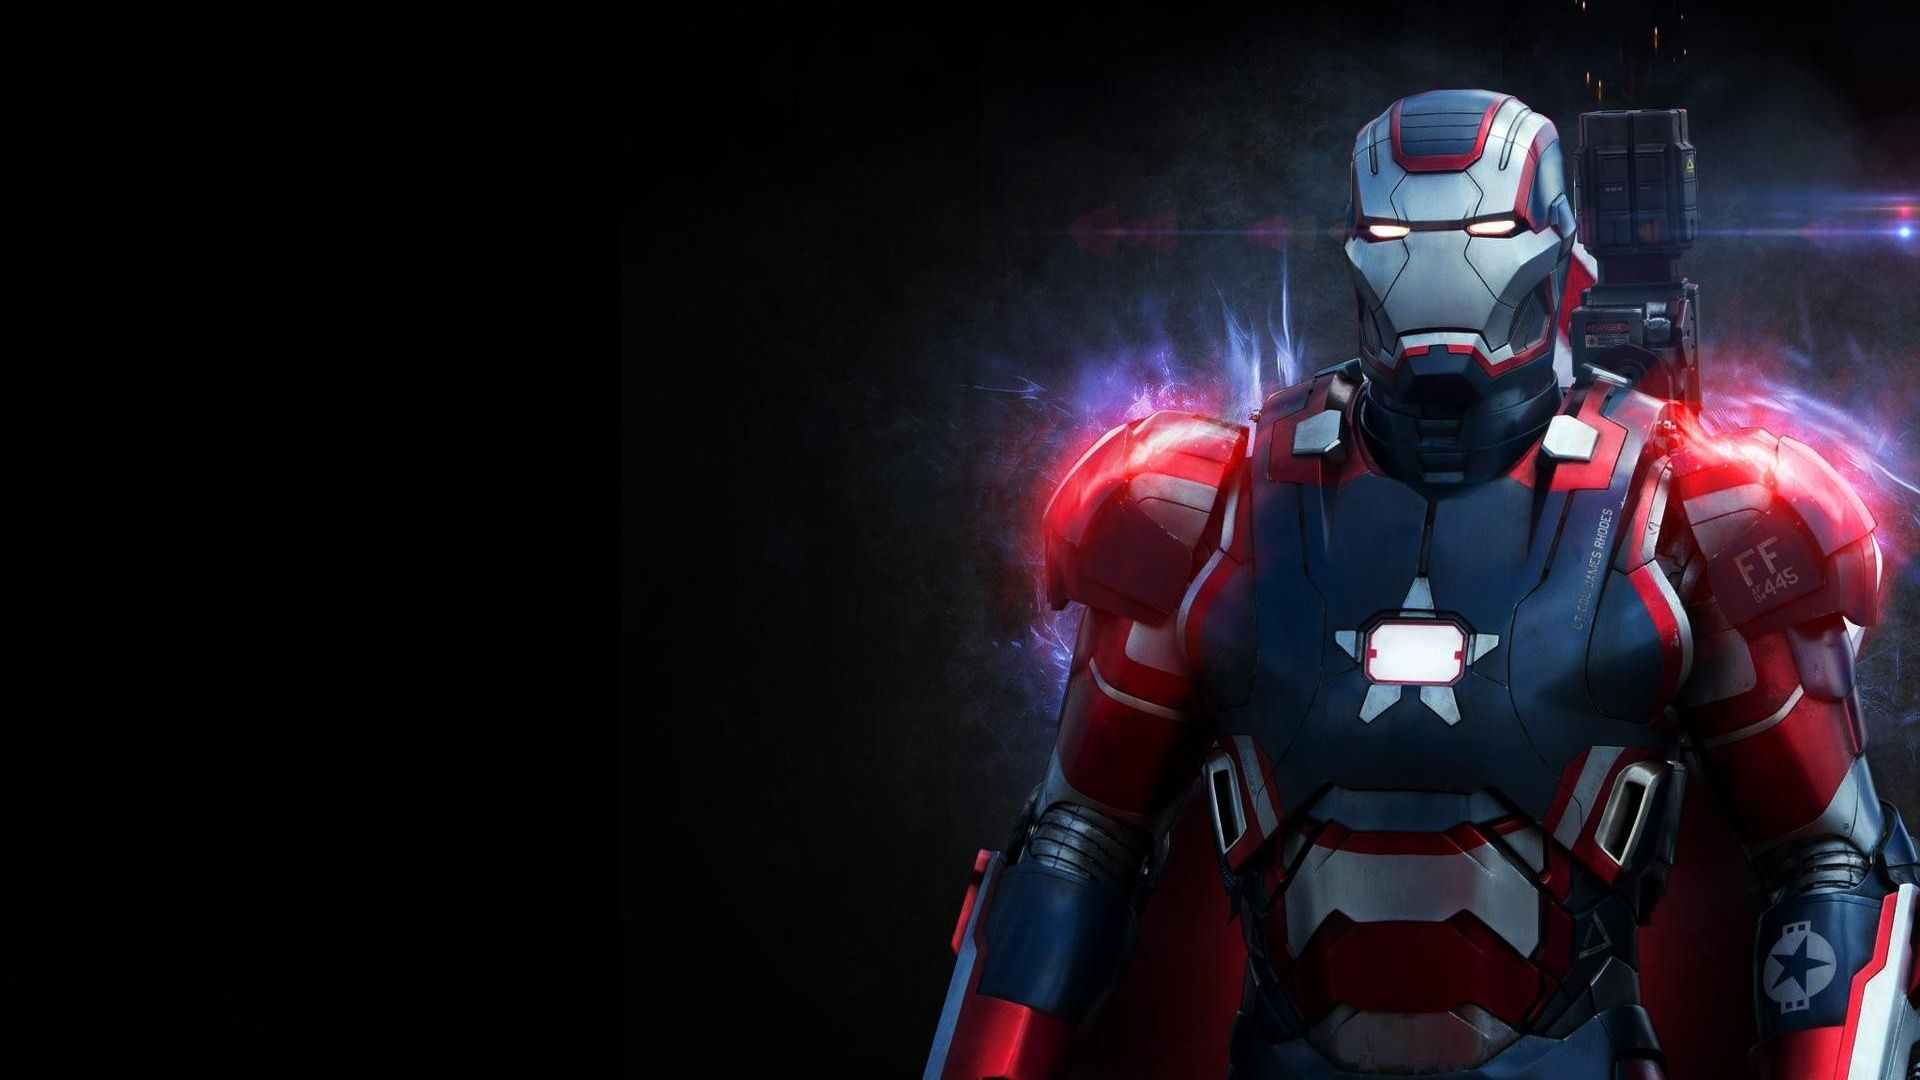 1920x1080 Iron Patriot Desktop Pc And Mac Wallpaper In 2020 Iron Man Wallpaper Superhero Wallpaper Iron Man